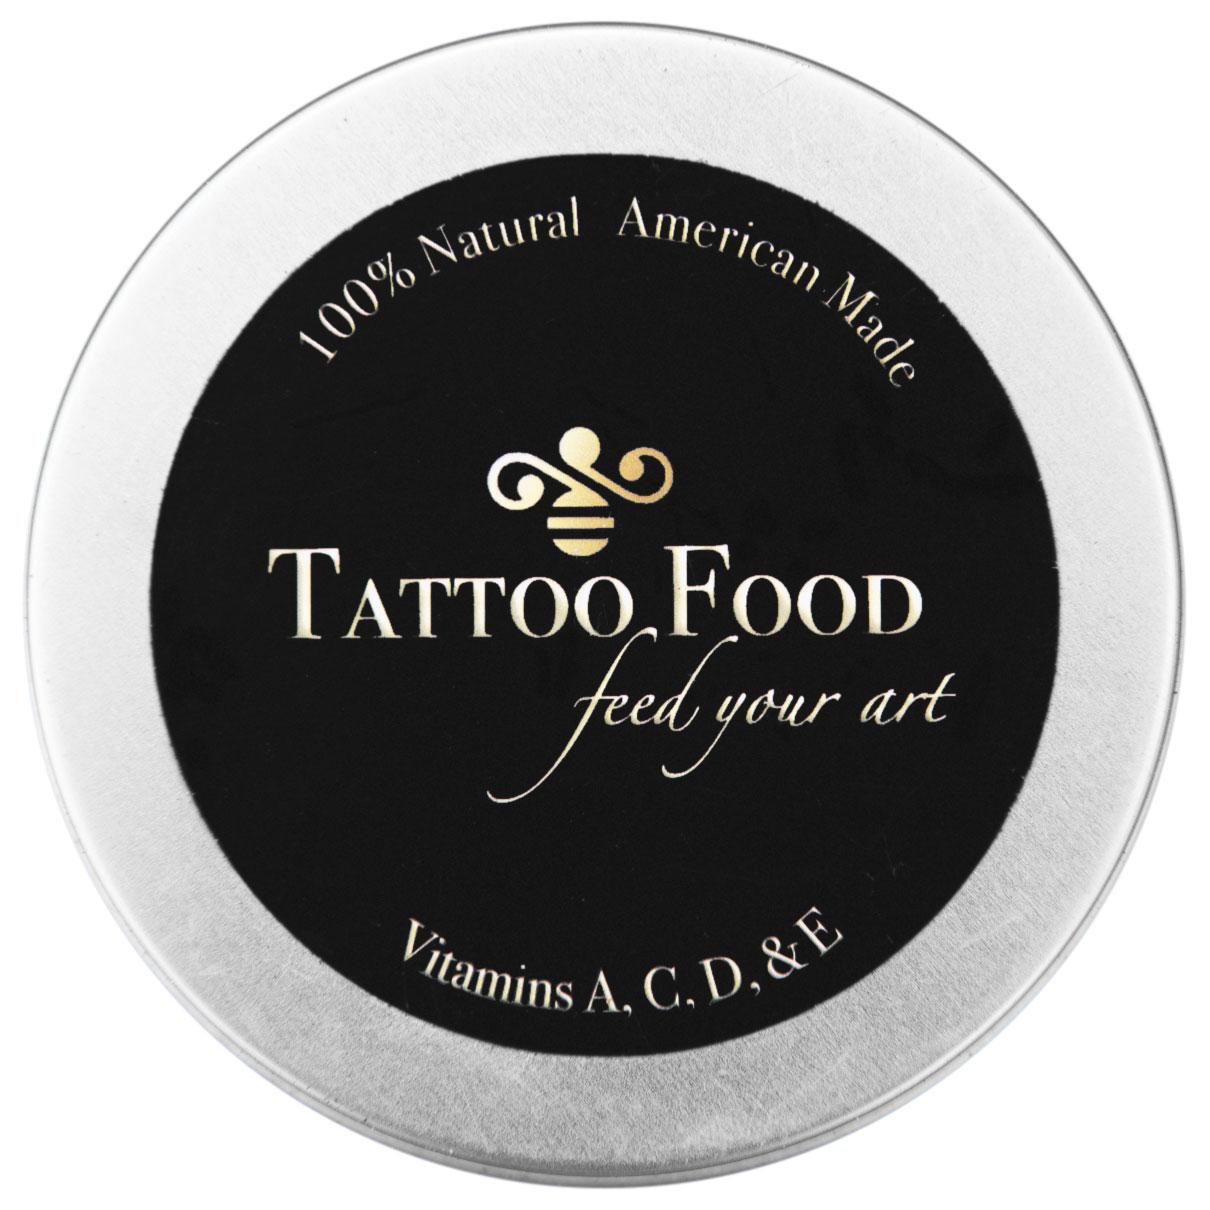 Riders Leather Seal Tattoo Food 4 oz